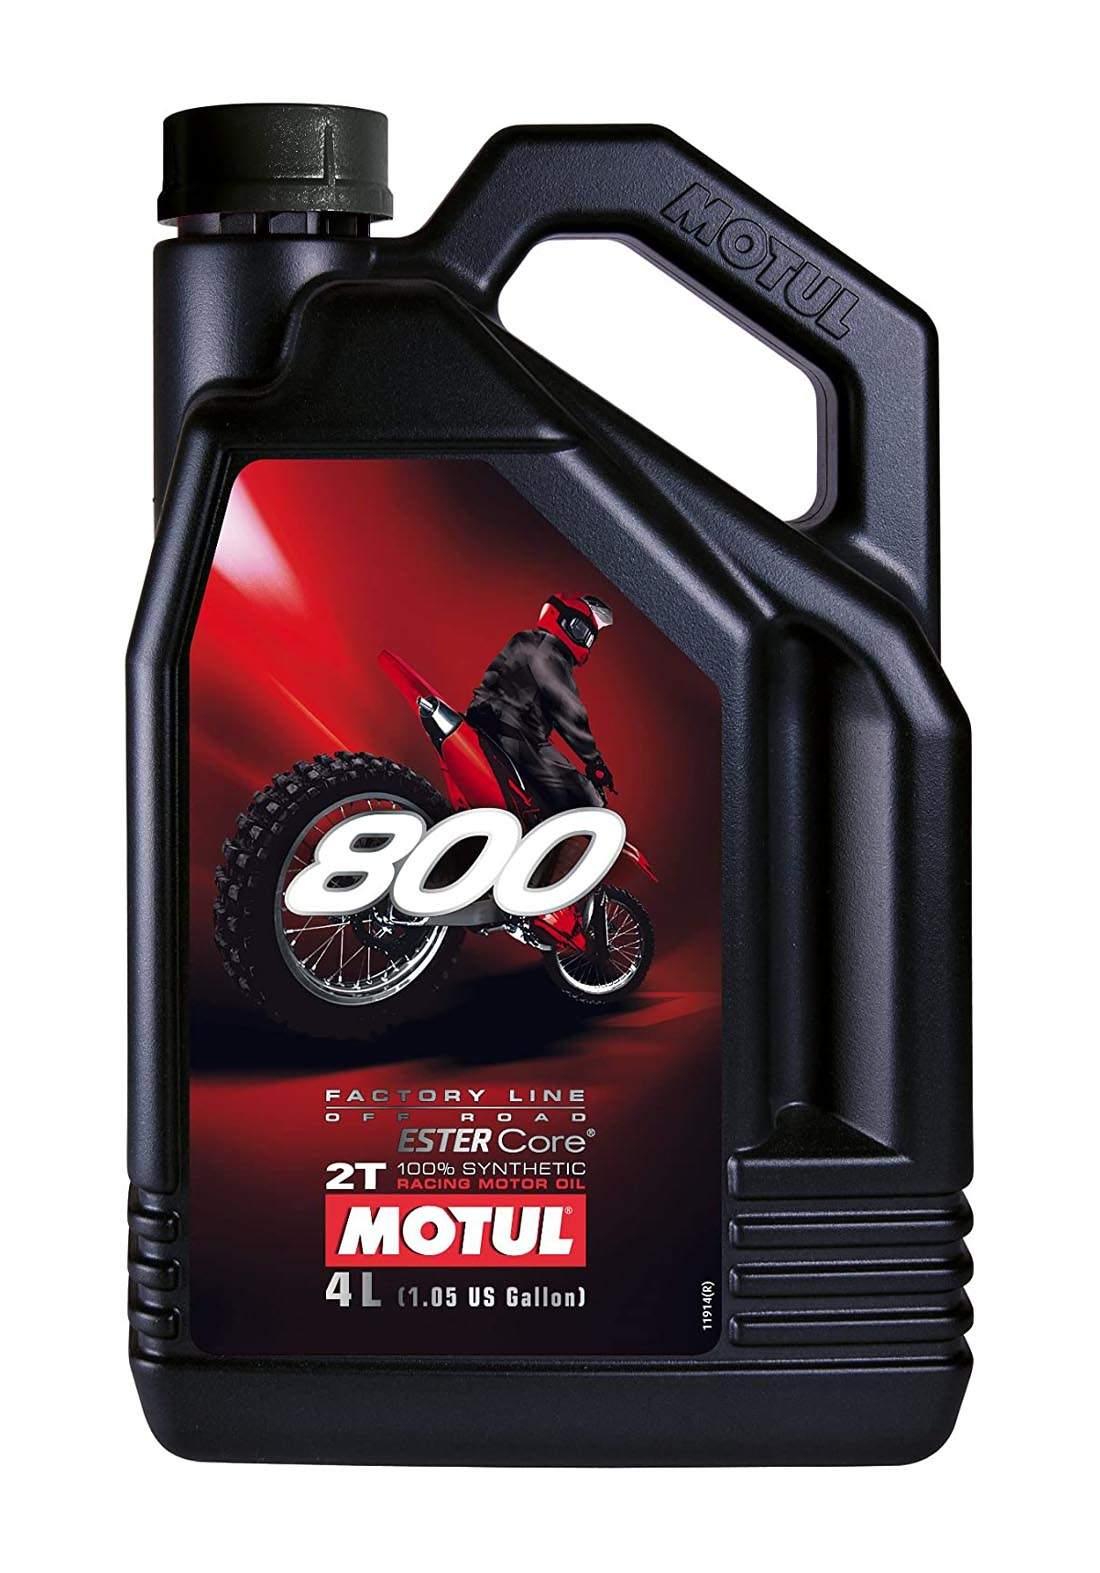 Motul 2T 800 Engine Oil  for 2-stroke 4 L زيت محرك الدراجة النارية